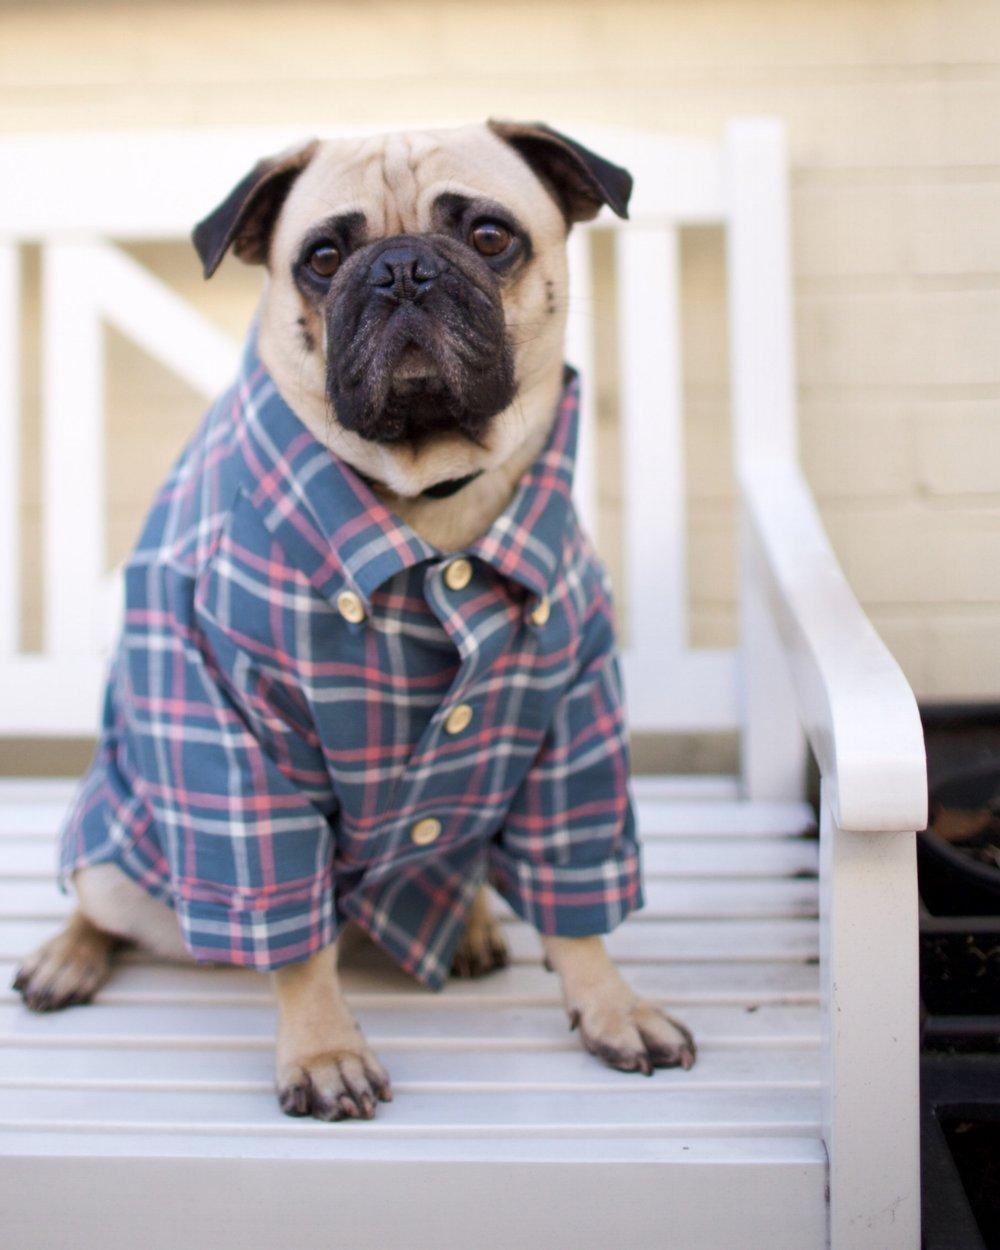 bestdogbloglondon-topdogbloglondon-bestdogblogever-petfashionblog-dogfashionblog-puglife-funnypug-pugsinclothes-fashionblog-london-shirtsfordogs-lele-shopdogthreads-humanandhound-twinning-dogfriendly-springtrends-dapperdogs-puppyinclothes-ukblogger